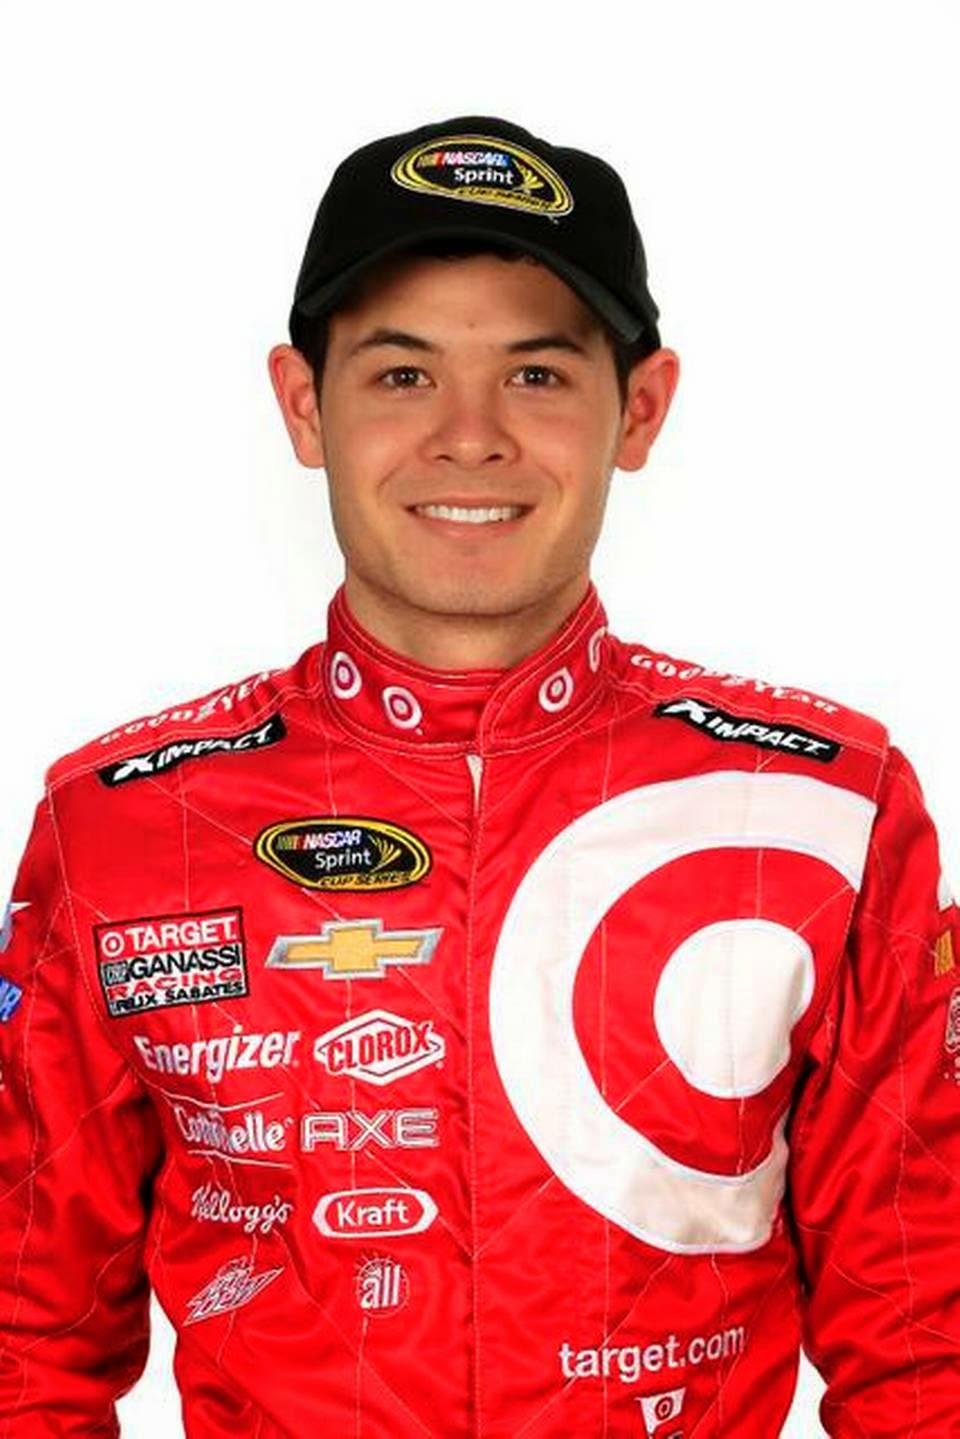 NASCAR Sprint Cup Rookie Rookie Kyle Larson